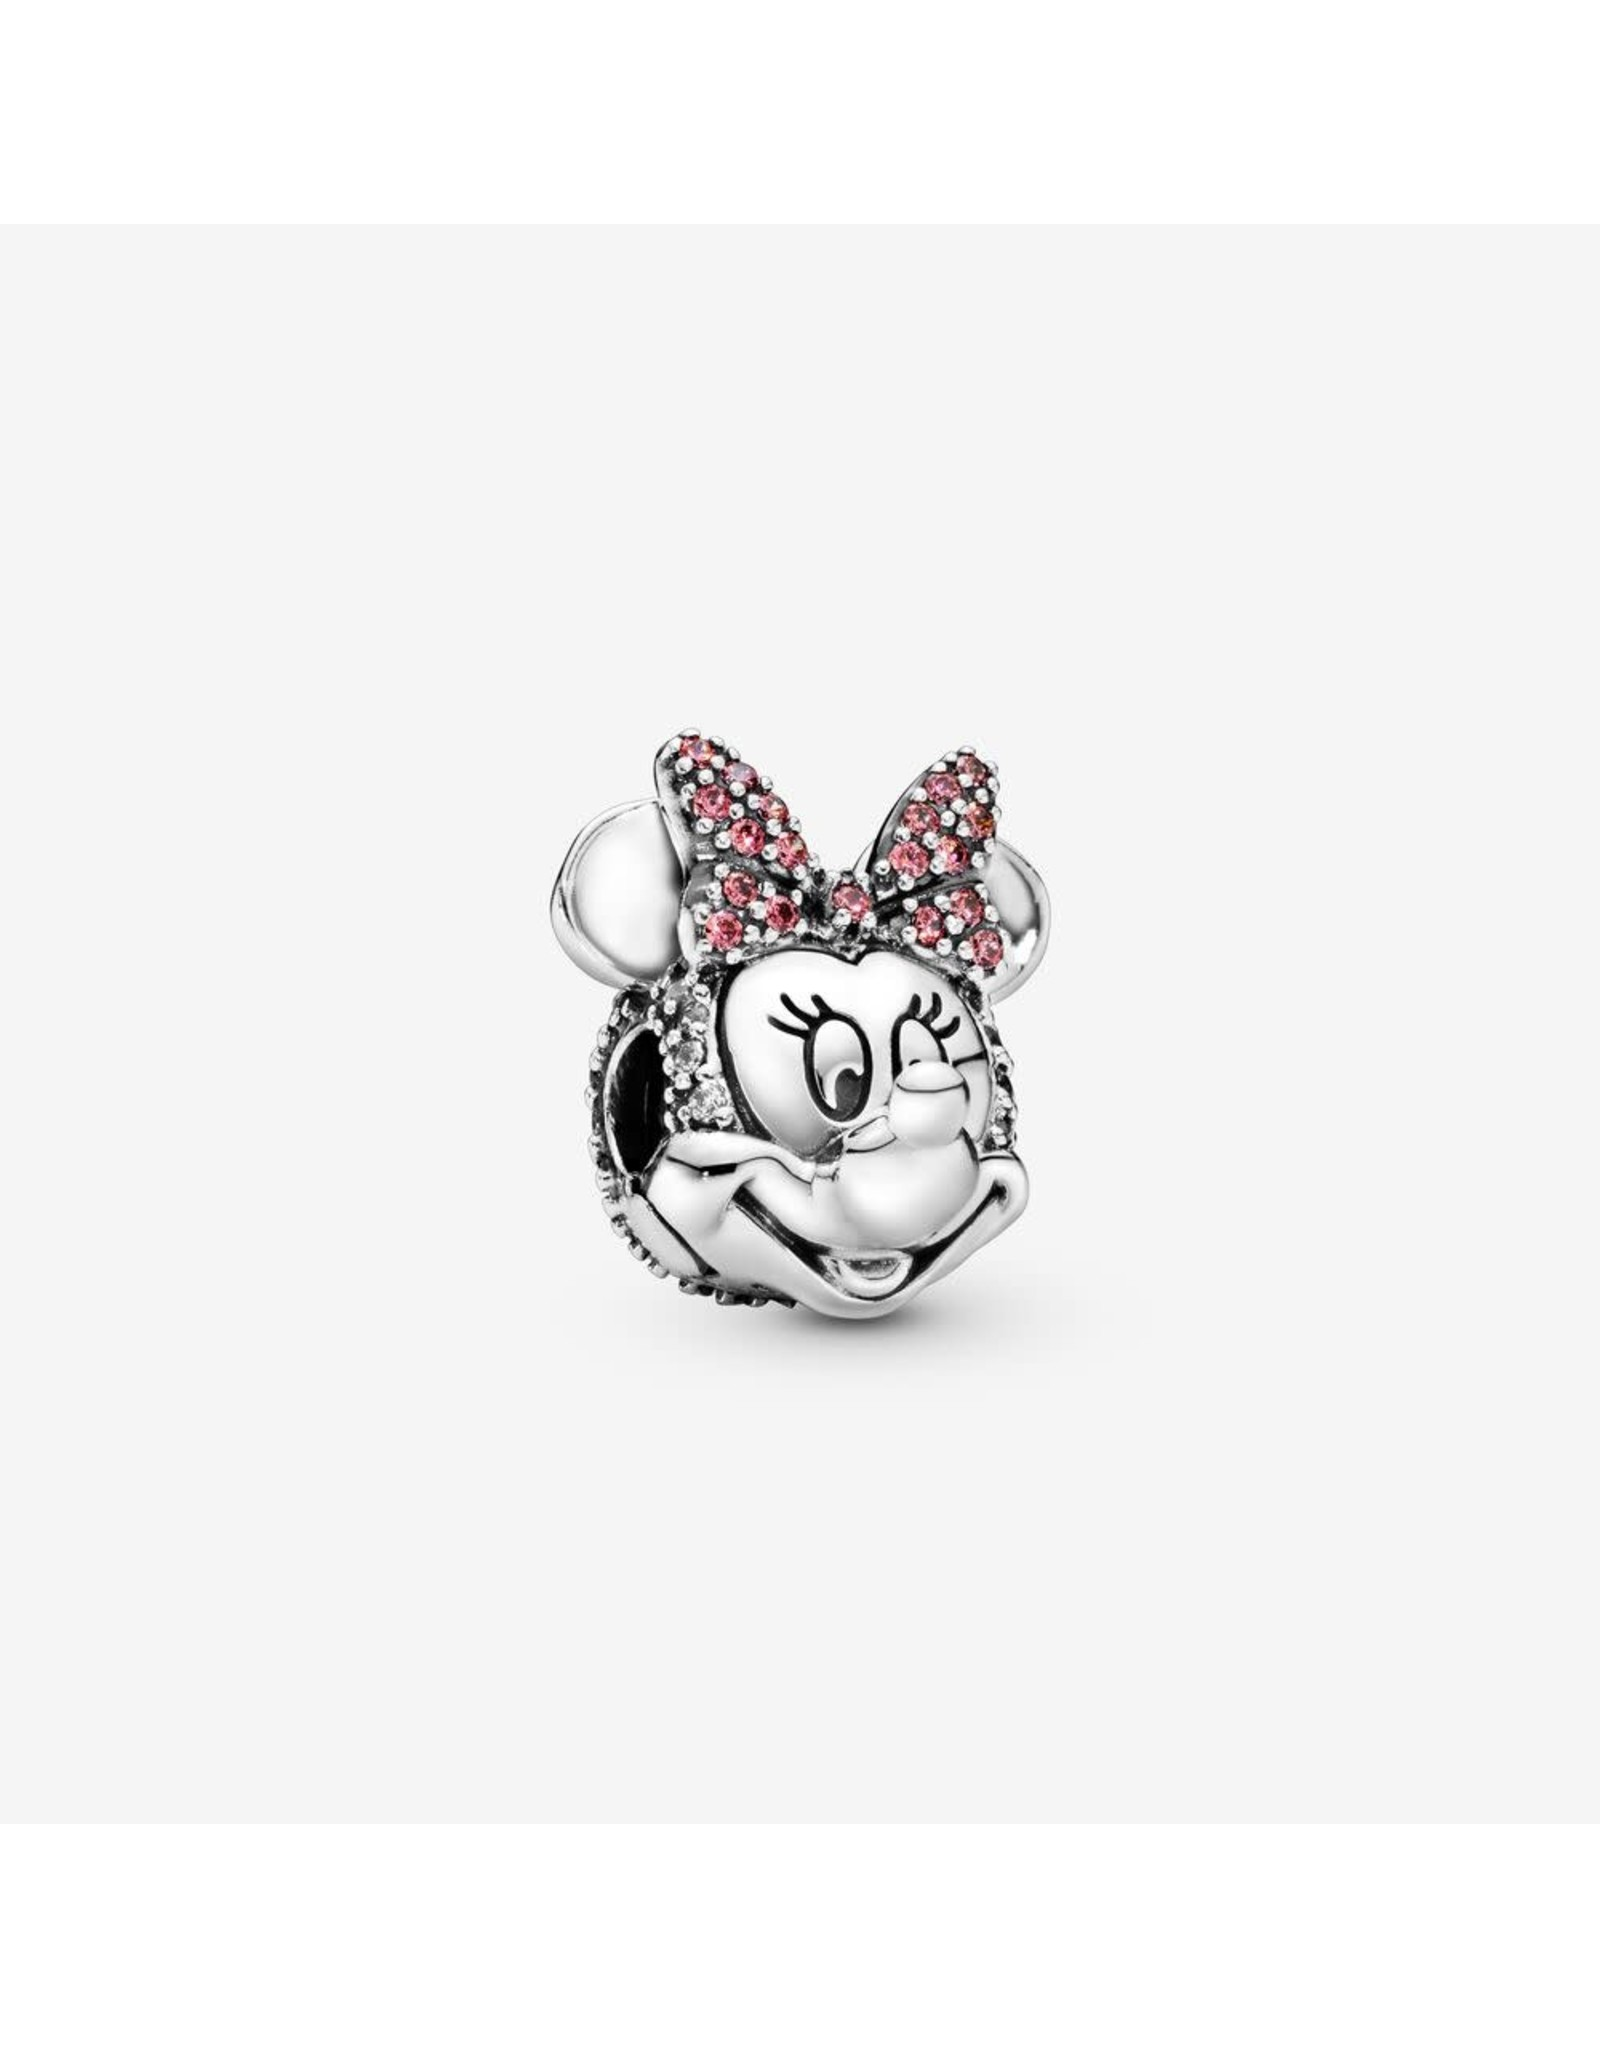 Pandora Pandora Clip, Disney Minnie Mouse, Pink & Clear CZ